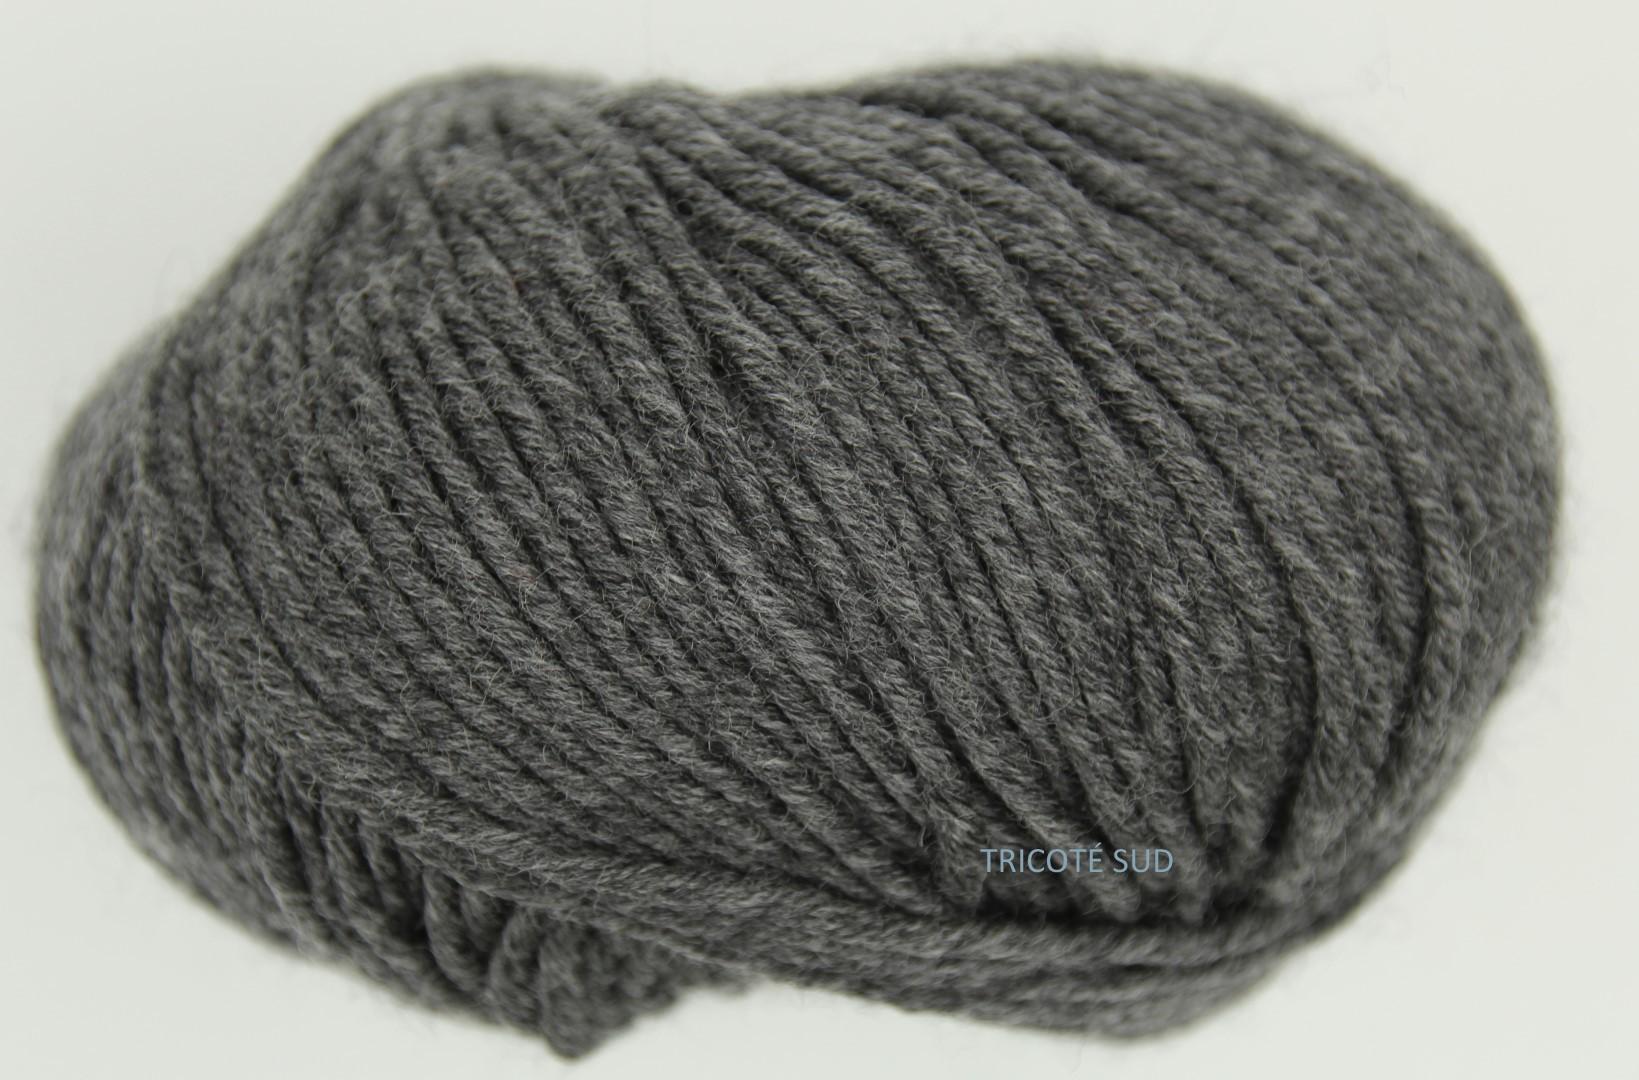 MERINO + LANG YARNS COLORIS 270 (1) (Large)